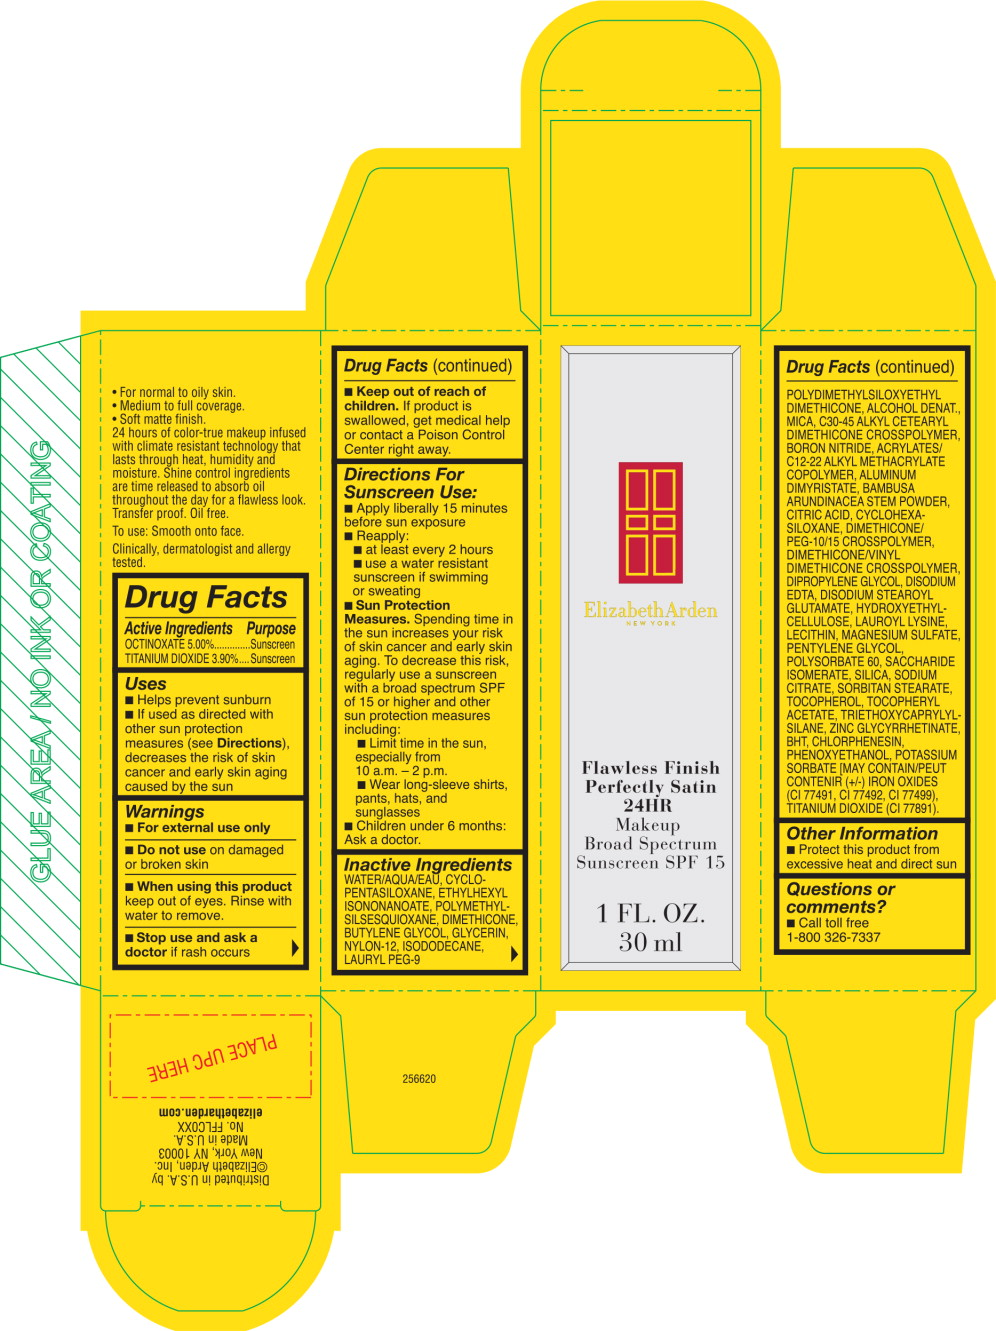 Flawless Finish Perfectly Satinb 24hr Makeup Shade Bisque (Octinoxate, Titanium Dioxide) Cream [Elizabeth Arden, Inc]